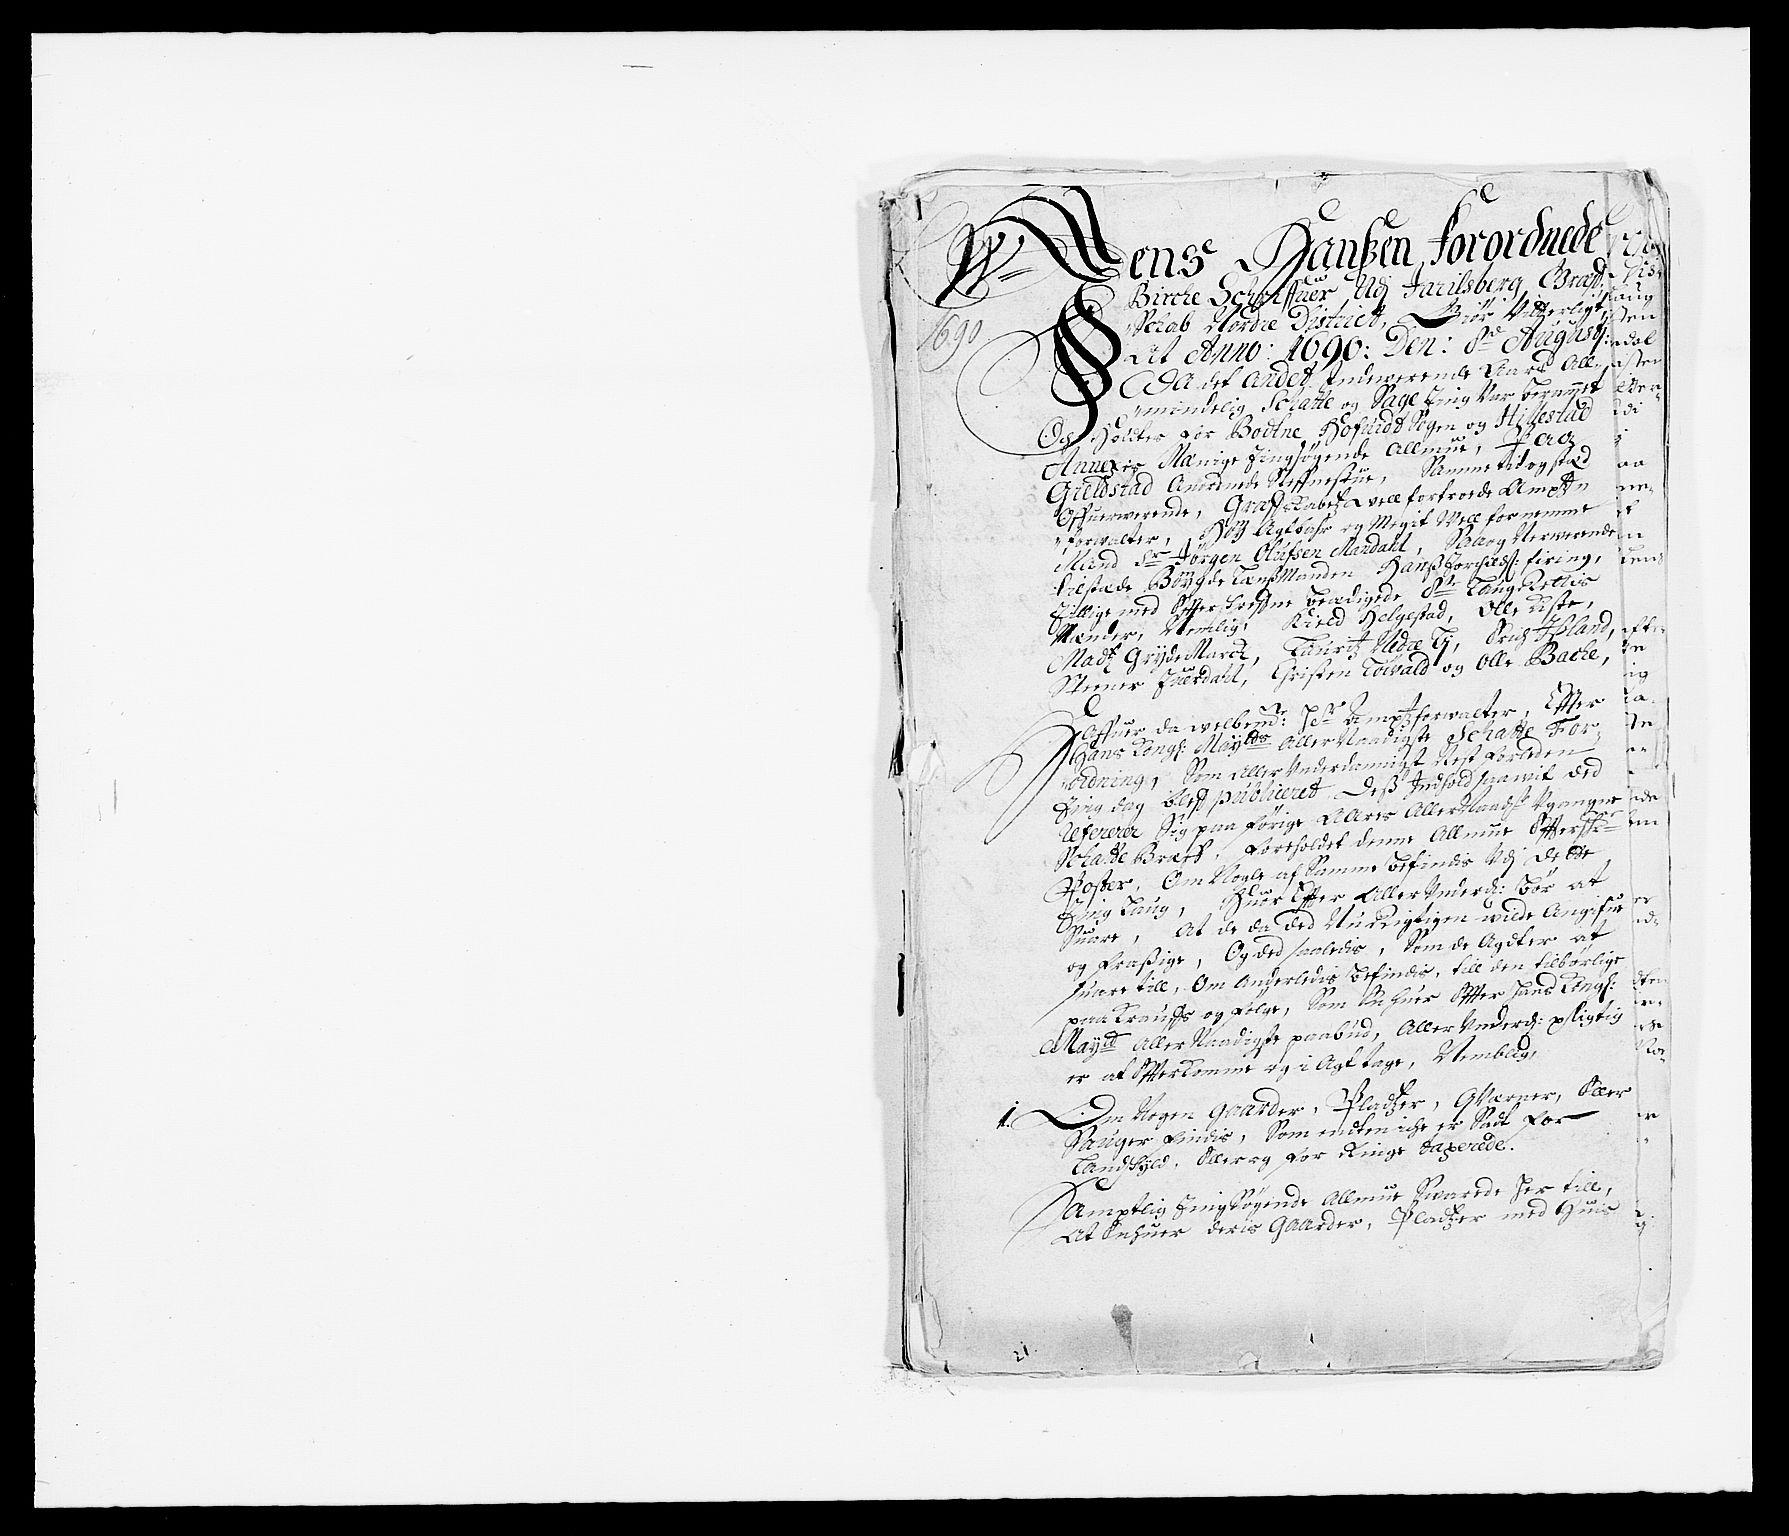 RA, Rentekammeret inntil 1814, Reviderte regnskaper, Fogderegnskap, R32/L1861: Fogderegnskap Jarlsberg grevskap, 1686-1690, s. 354